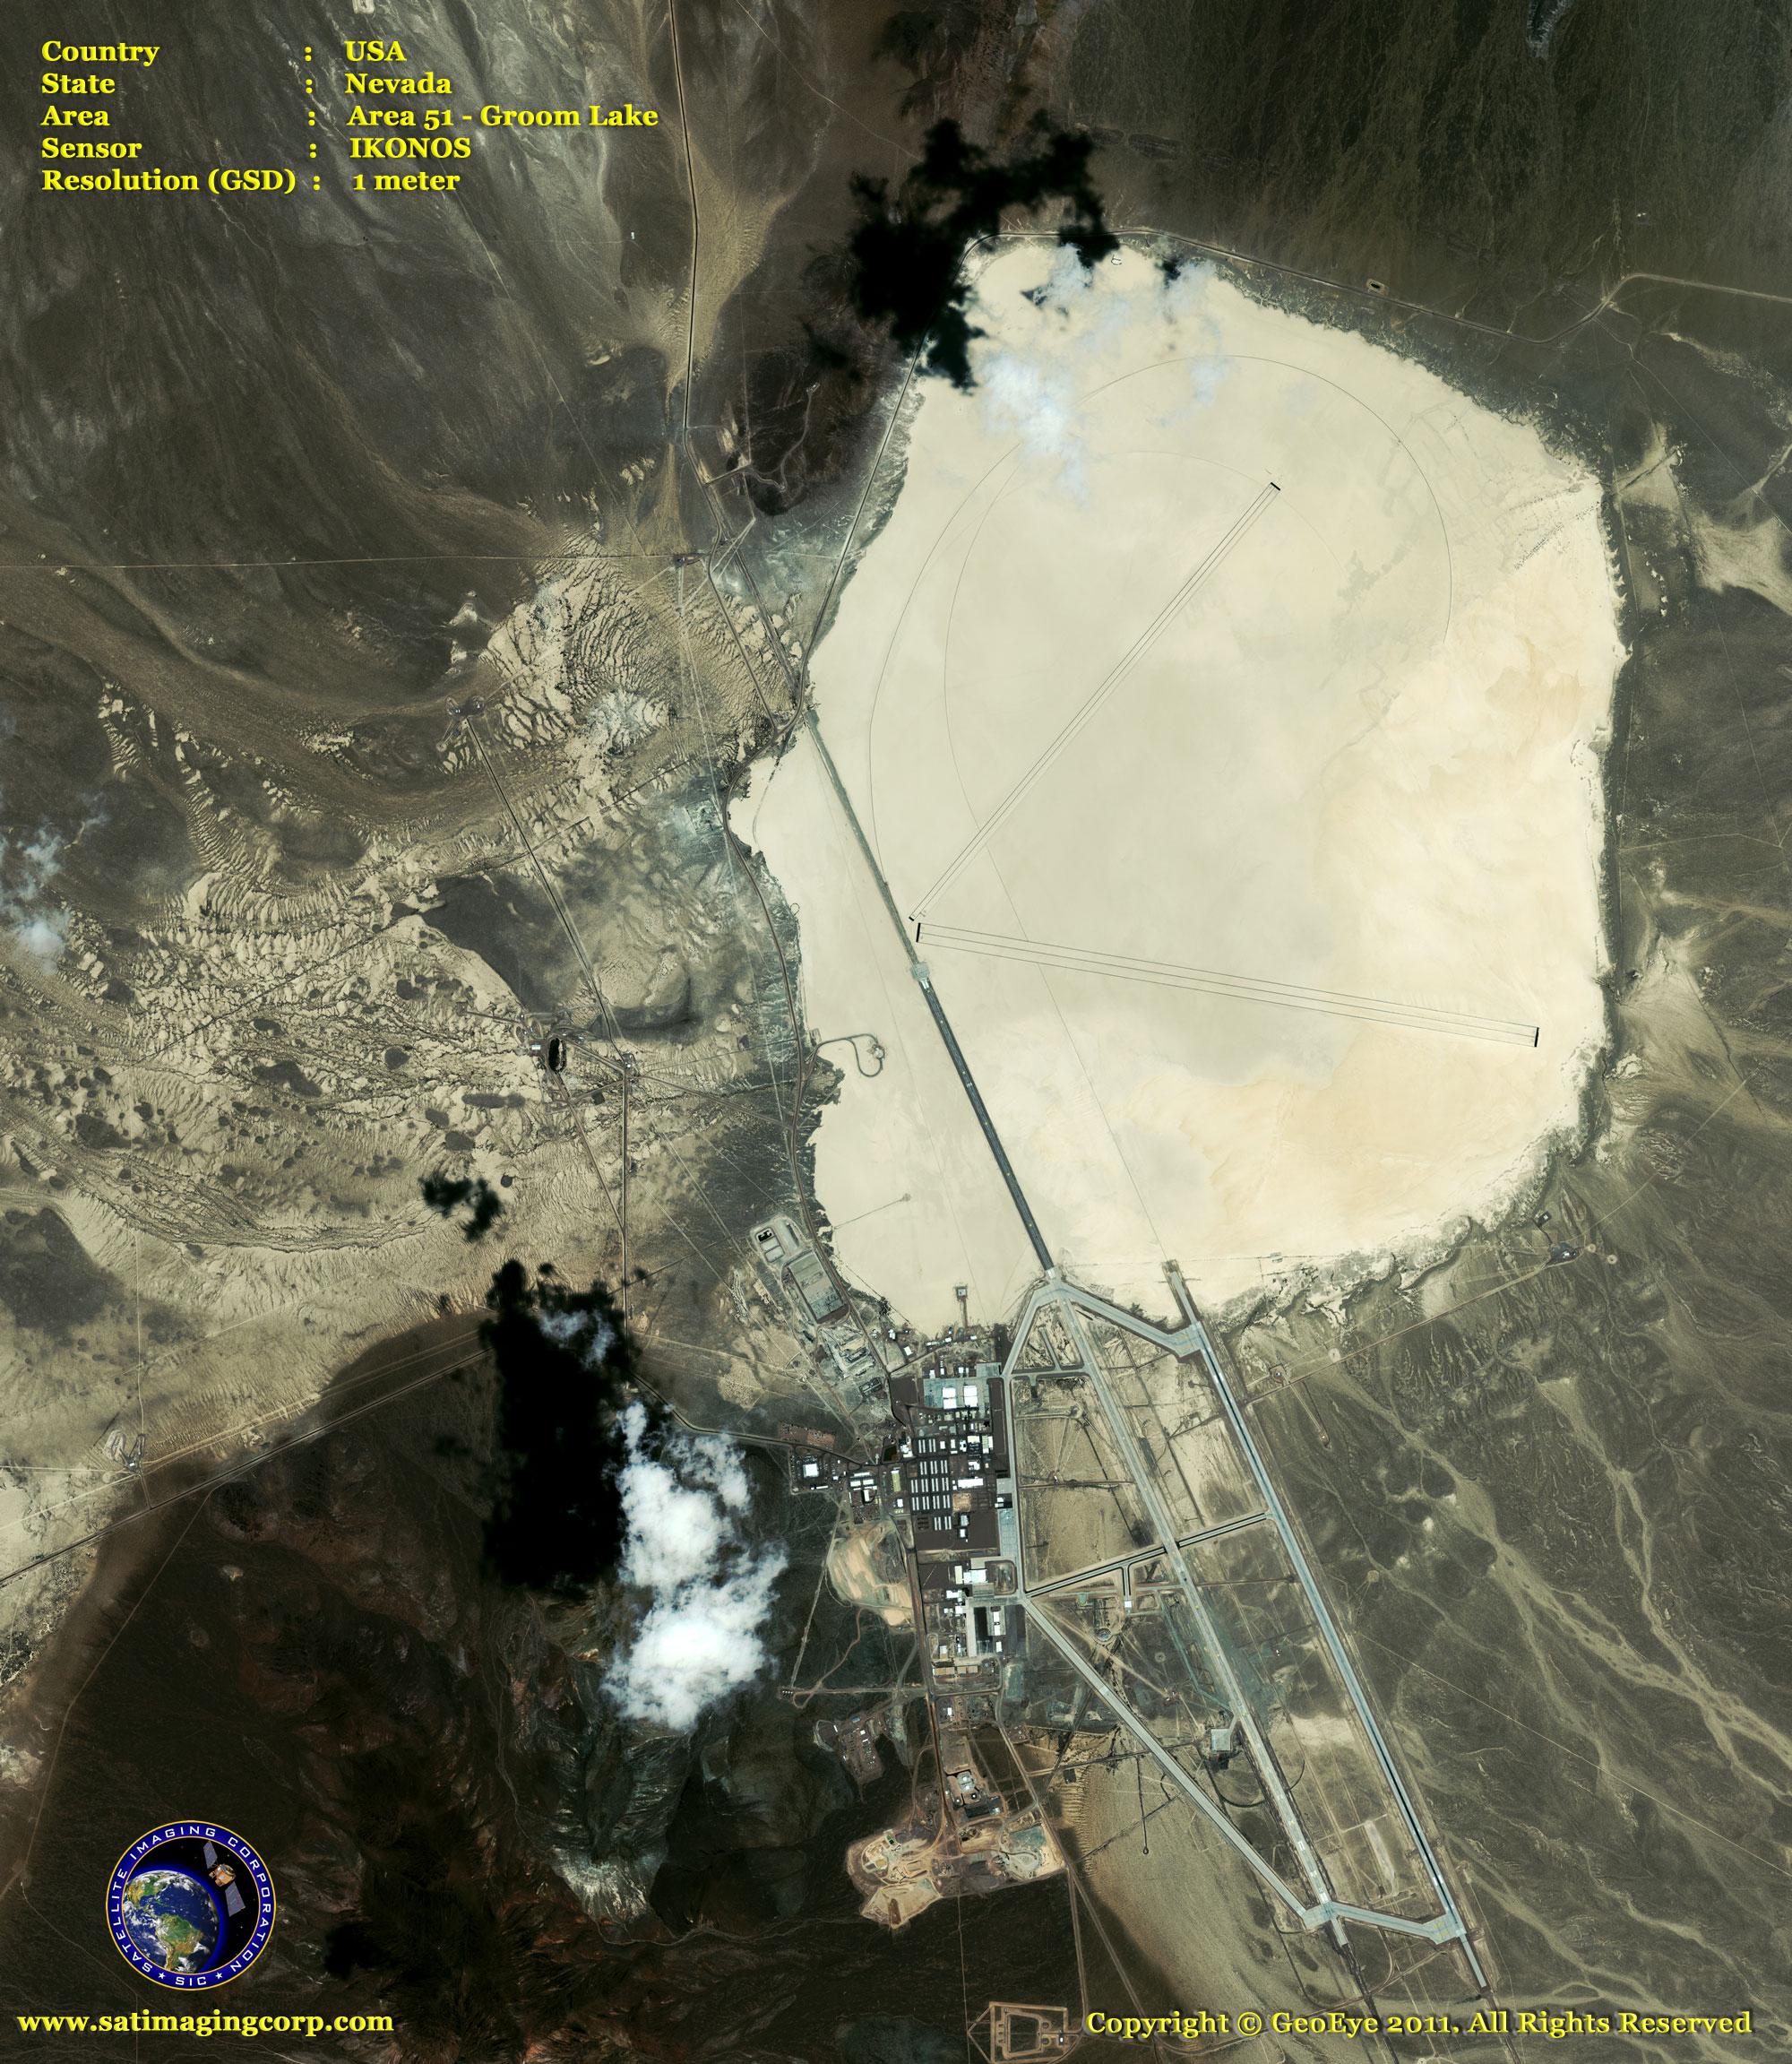 Ikonos Area 51